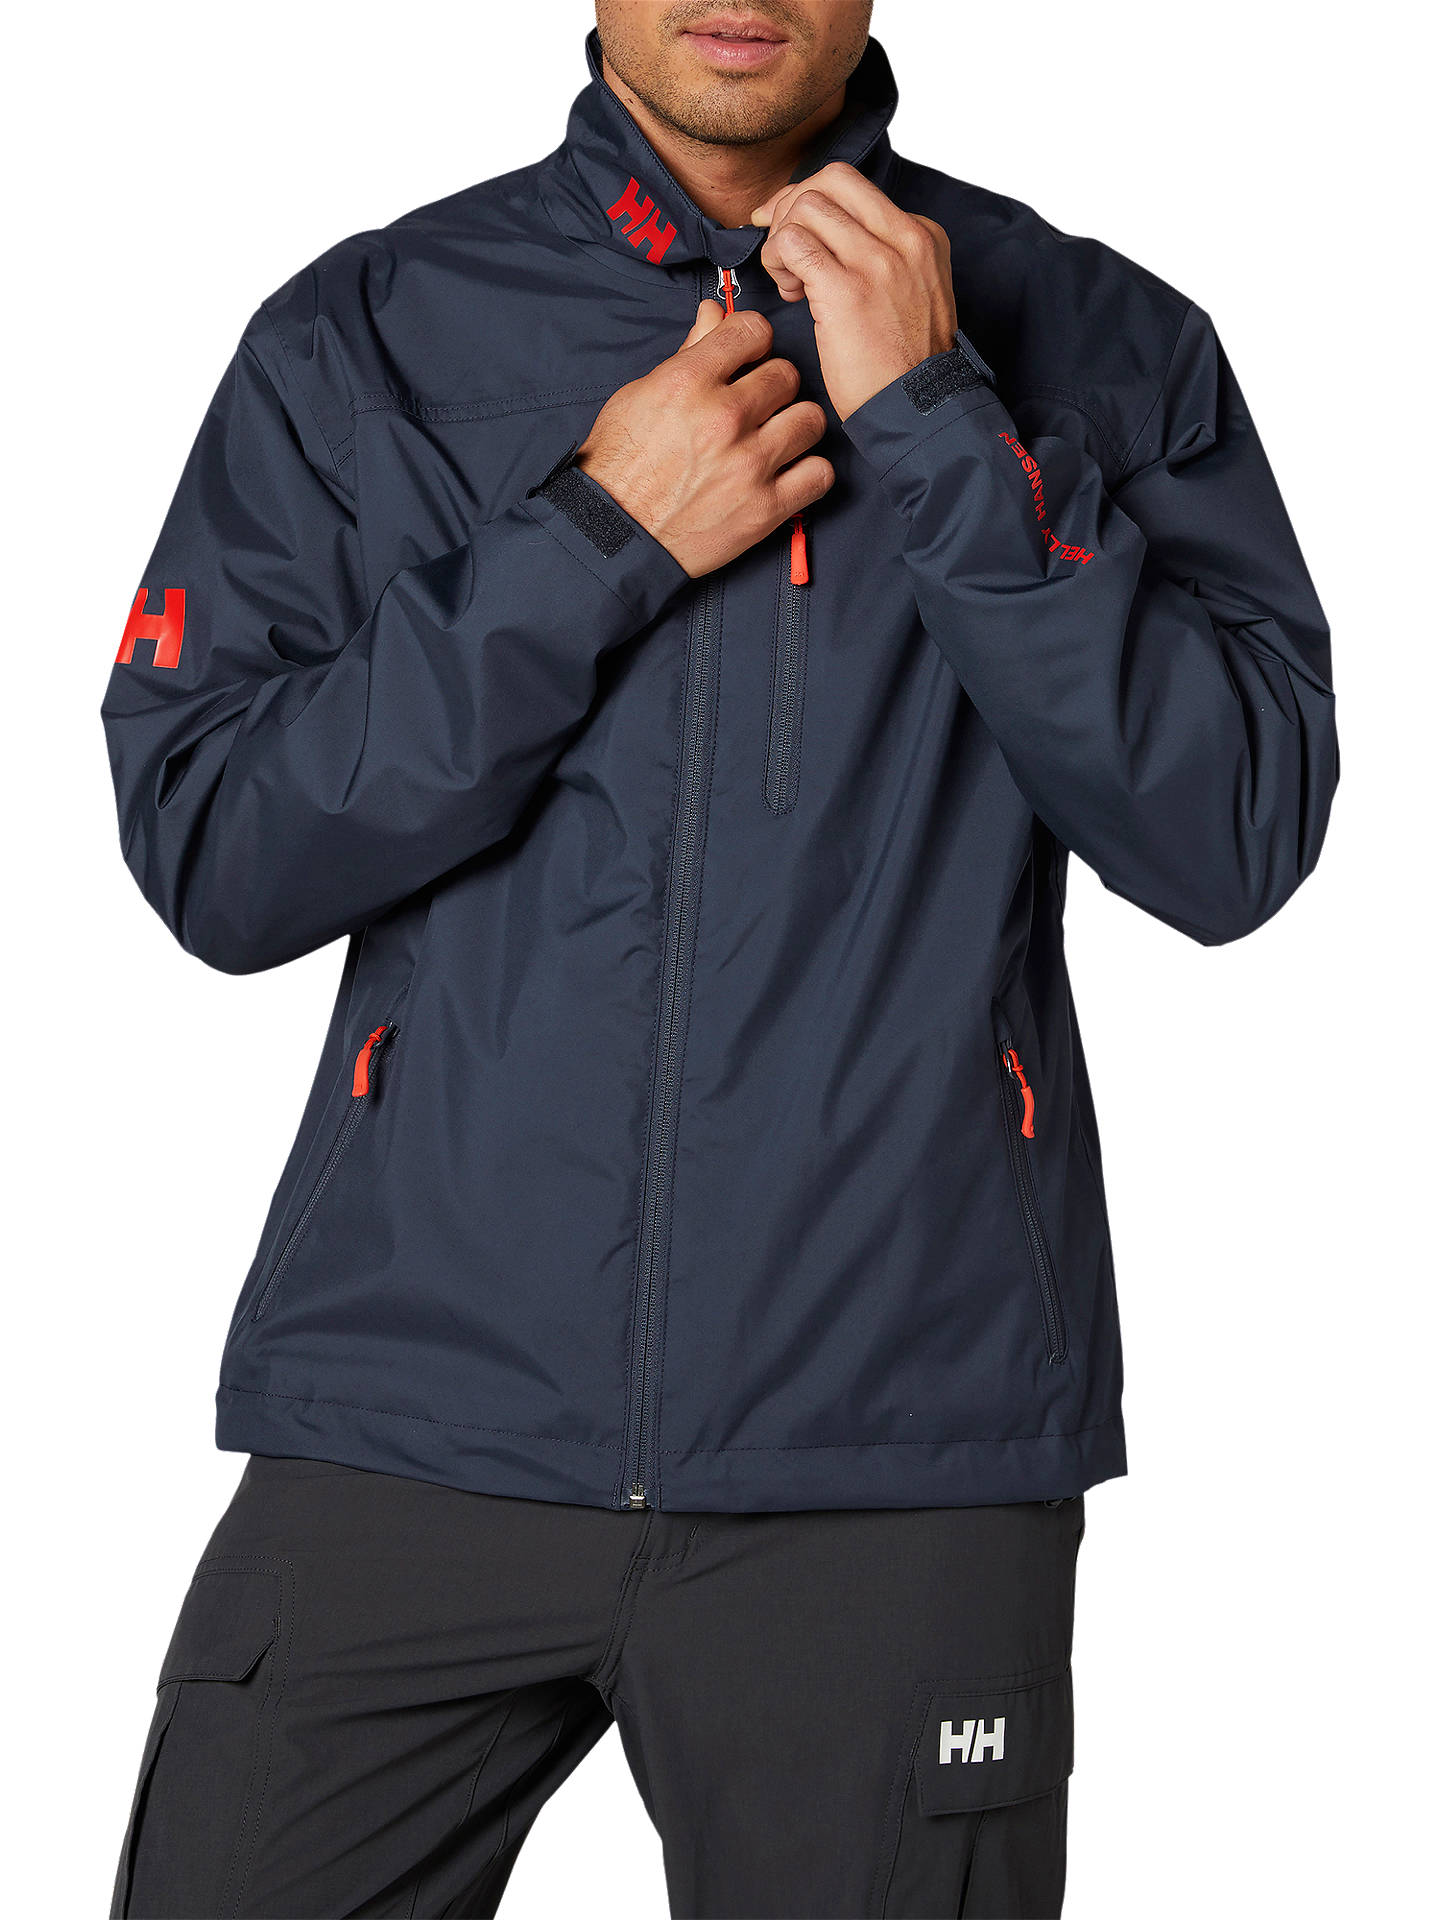 f8430916ea0 Buy Helly Hansen Crew Midlayer Men's Waterproof Jacket, Graphite Blue, S  Online at johnlewis ...